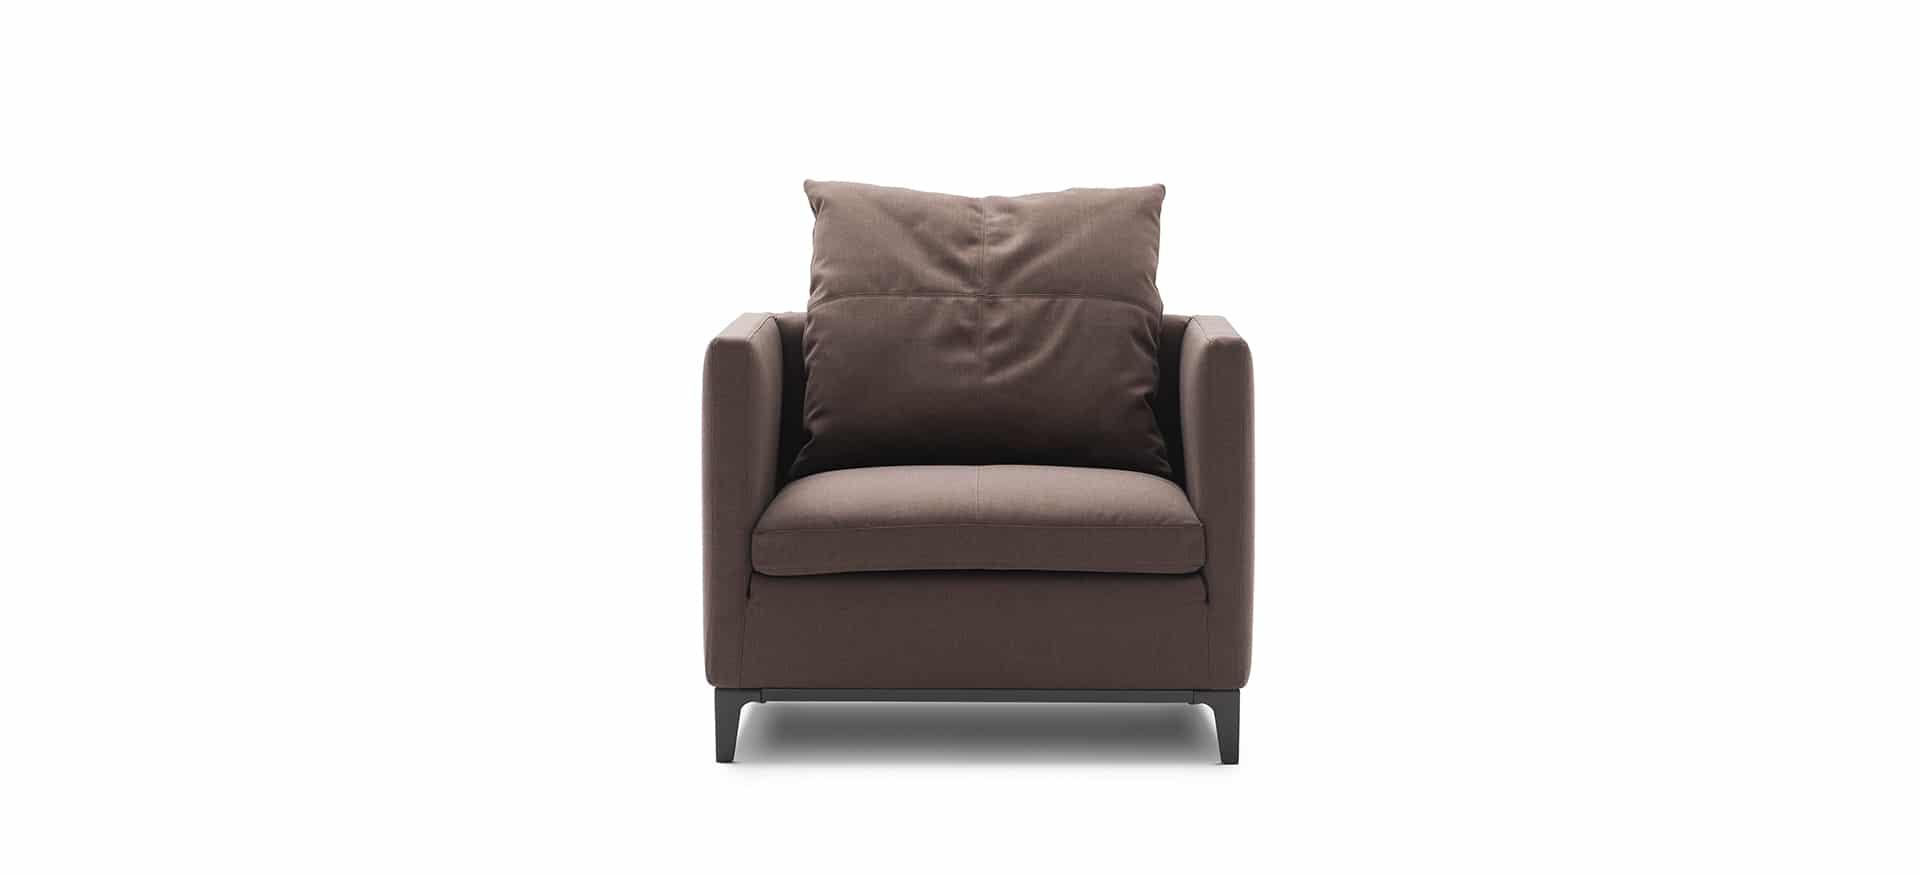 Balance Plus Chair